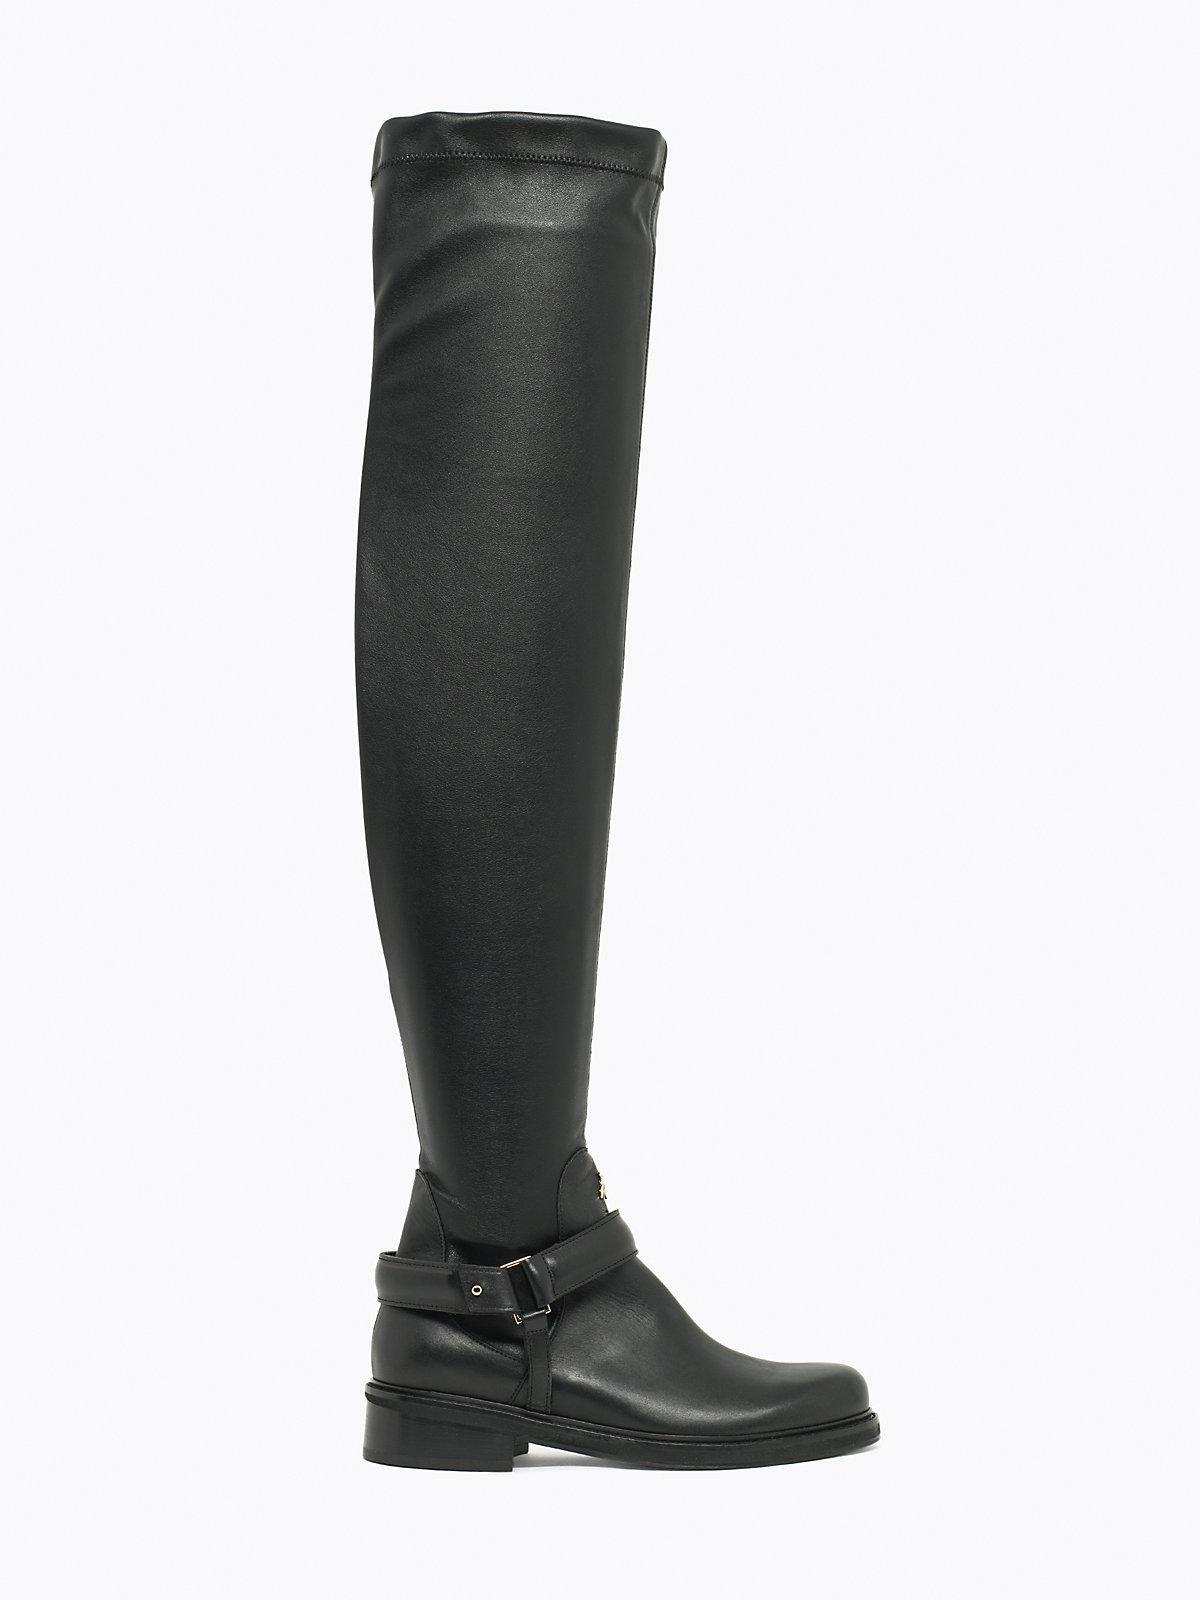 patrizia pepe thigh high biker boots in multicolour lyst